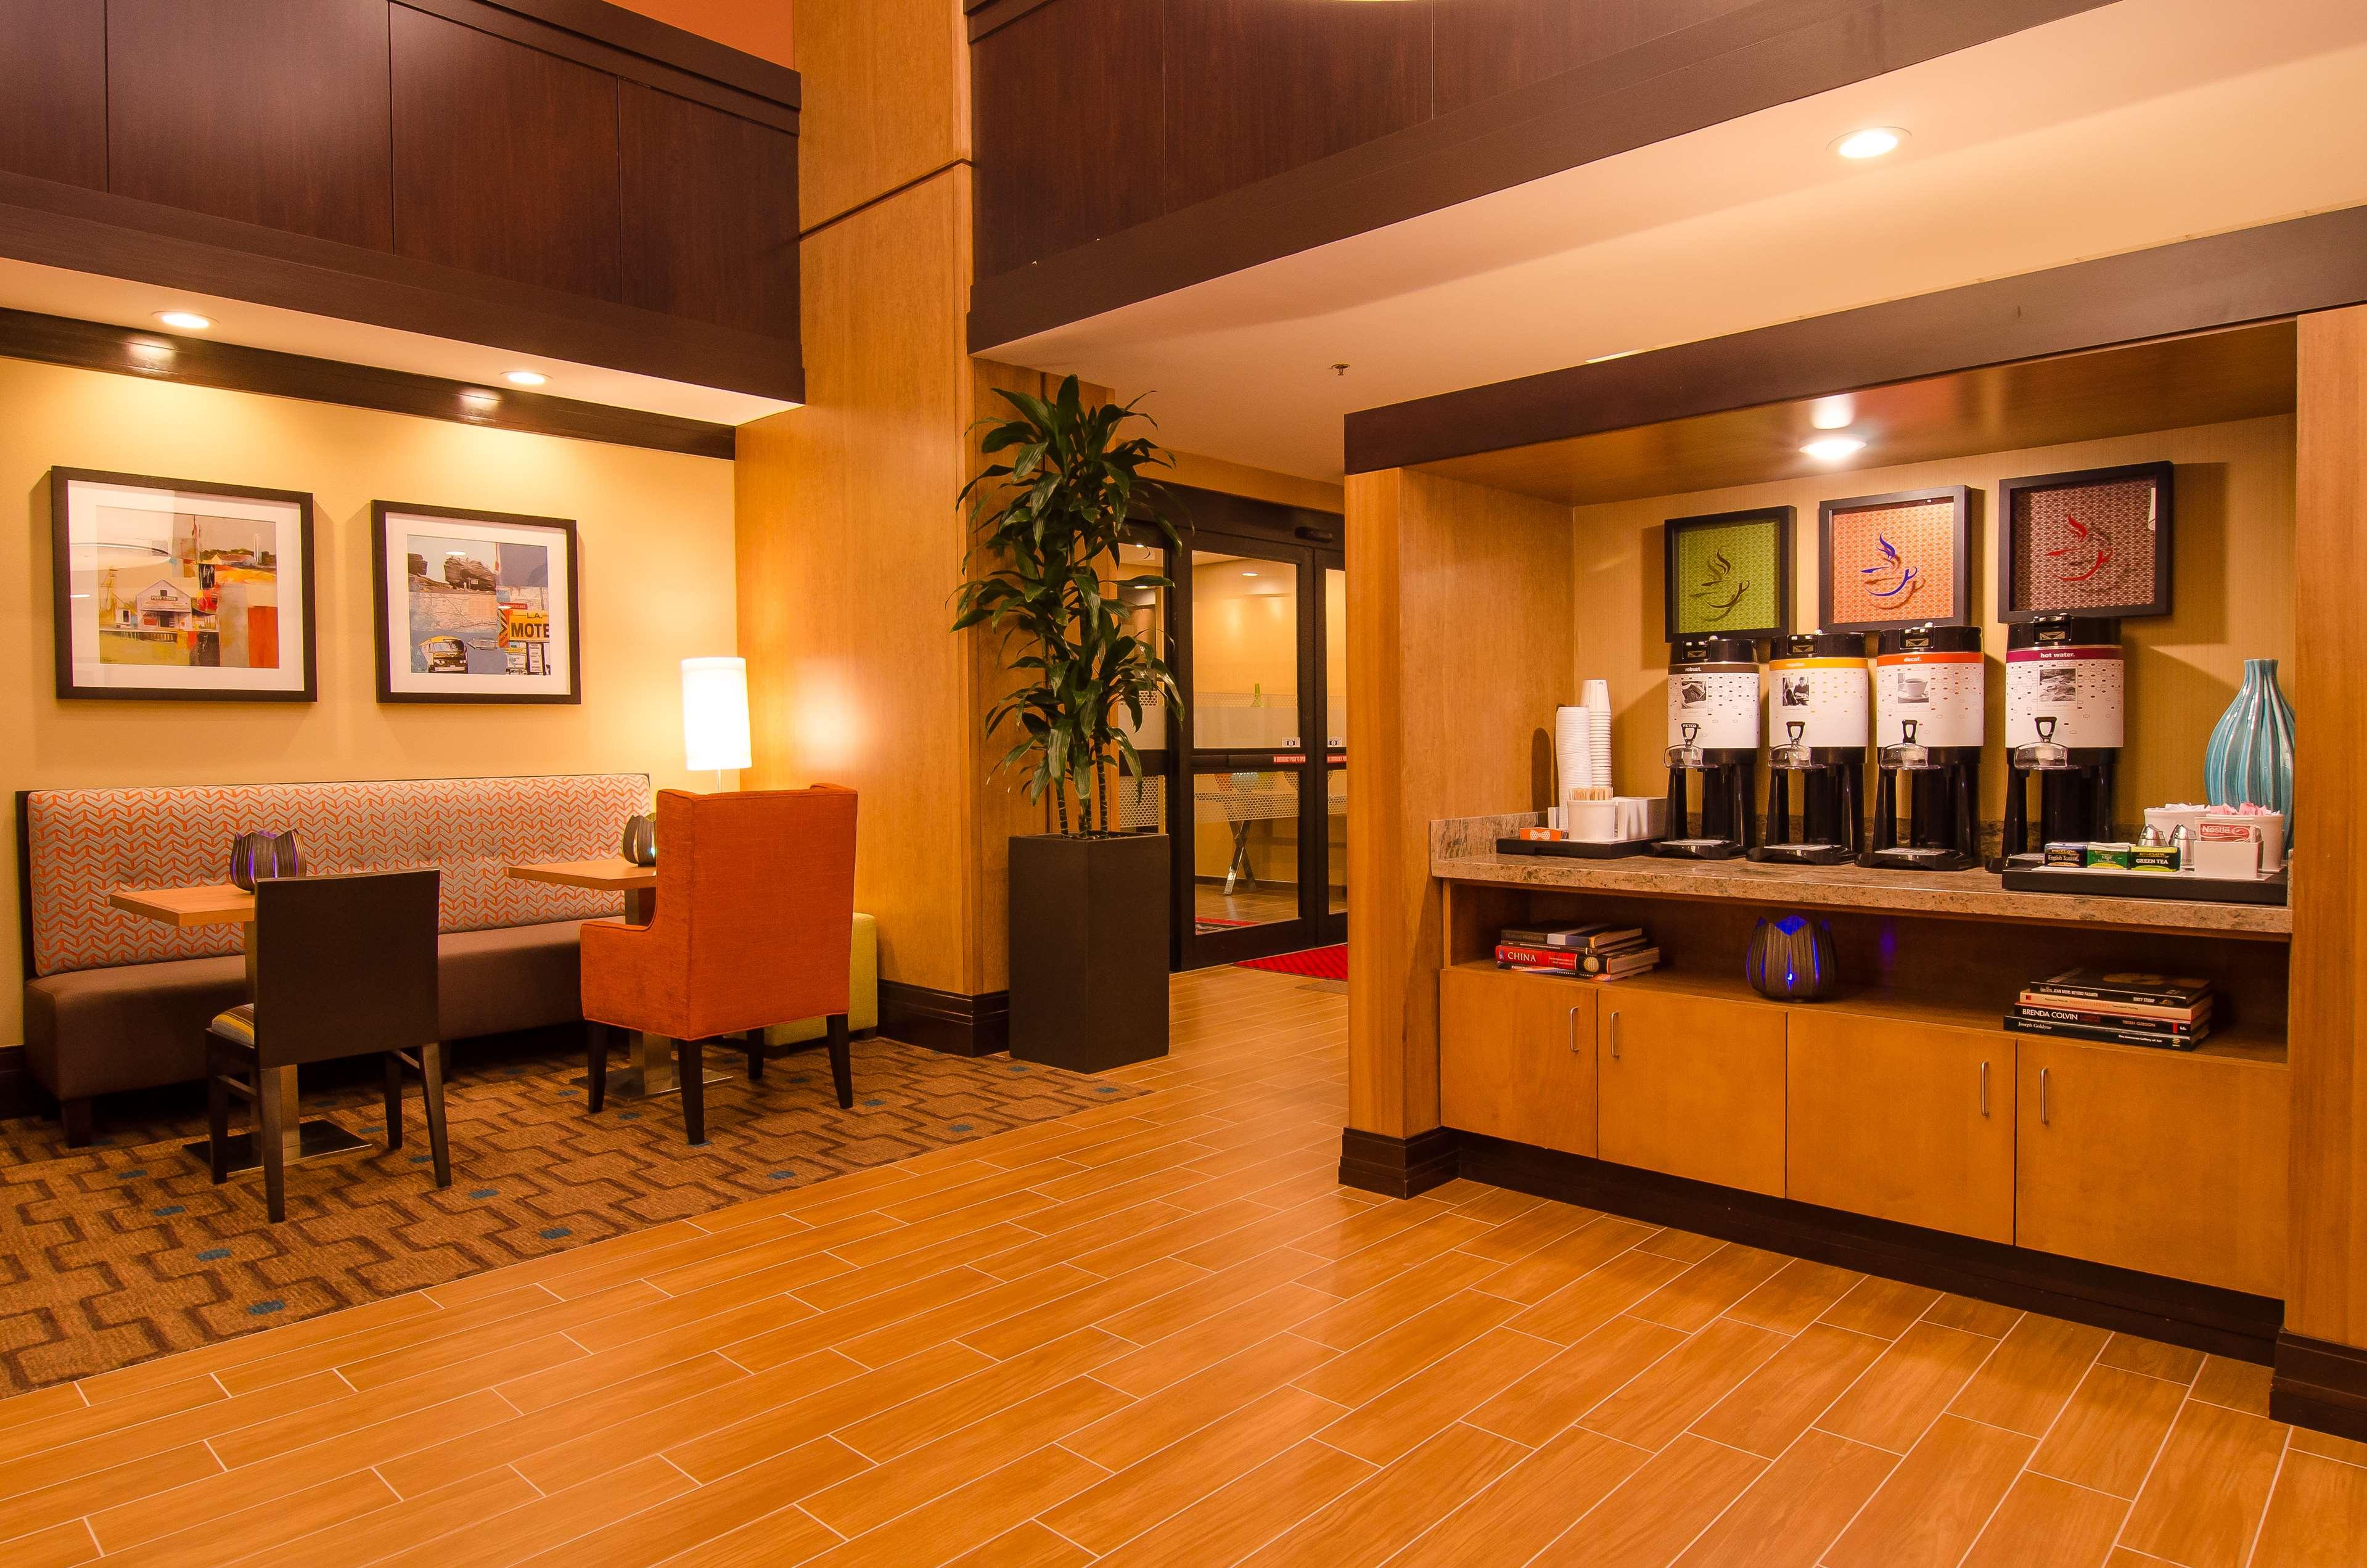 Hampton Inn & Suites Houston North IAH image 11